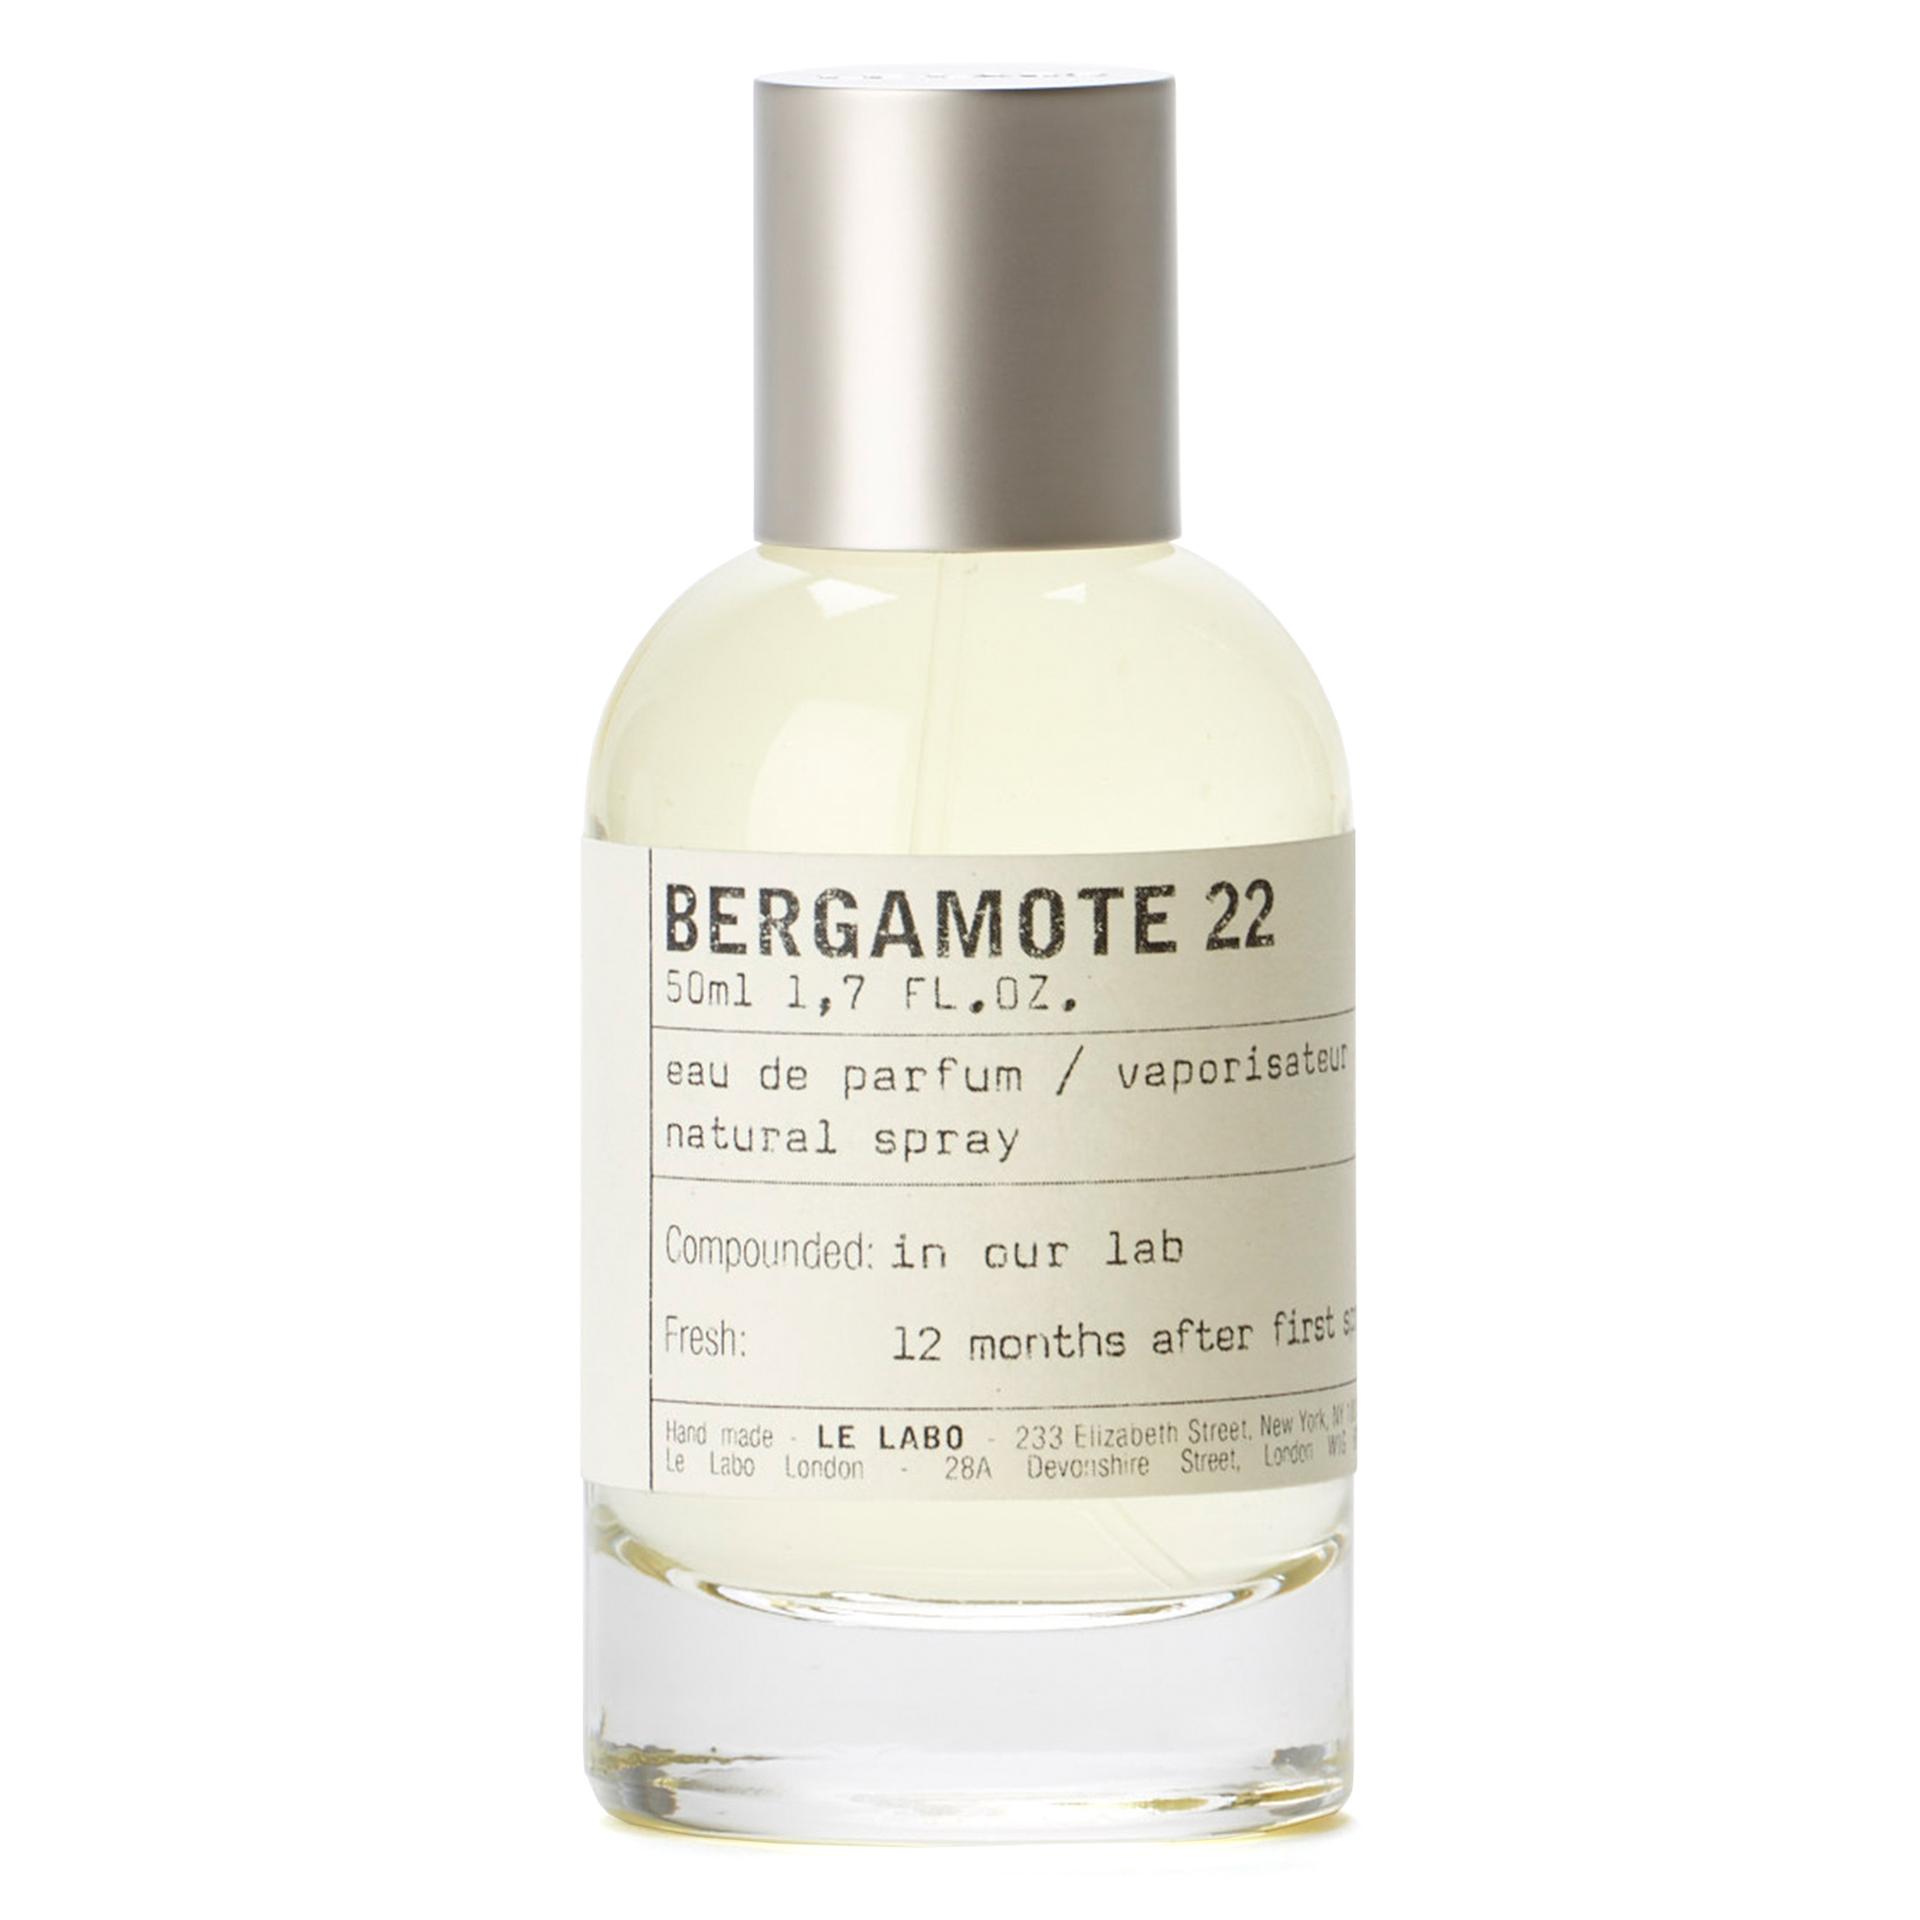 Bergamote 22 Edp 50ml